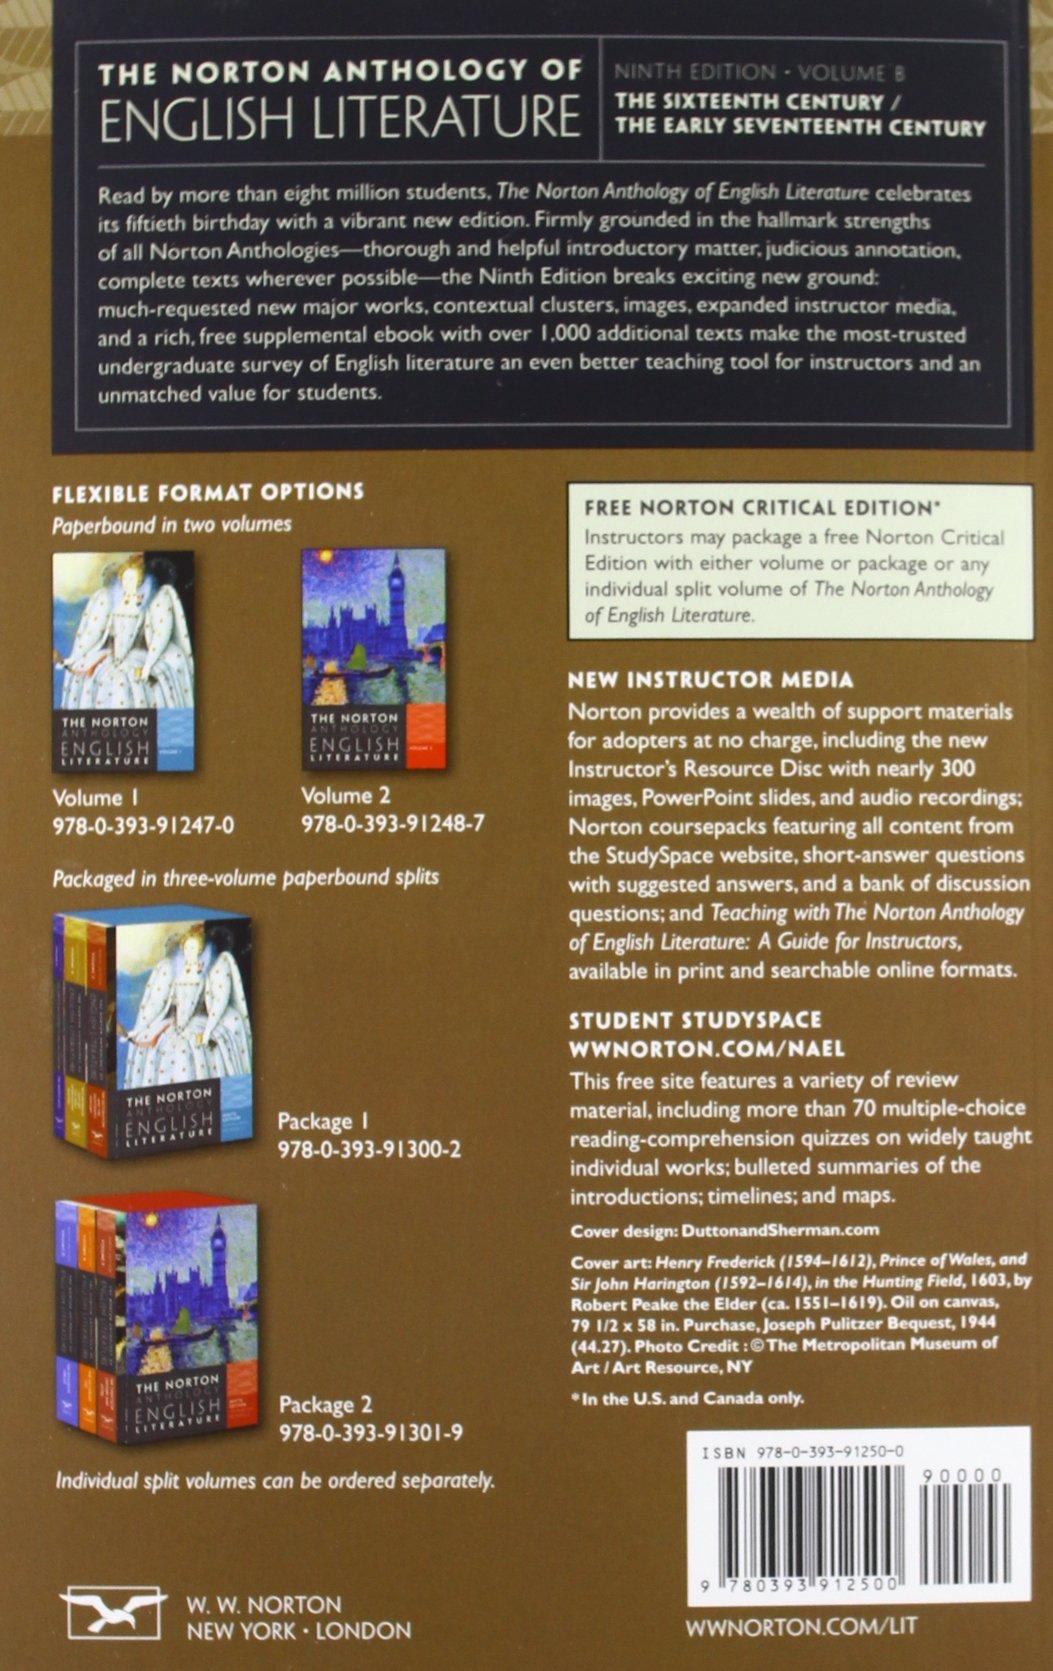 The norton anthology of english literature a b c amazon the norton anthology of english literature a b c amazon stephen greenblatt carol t christ alfred david barbara k lewalski lawrence lipking fandeluxe Image collections